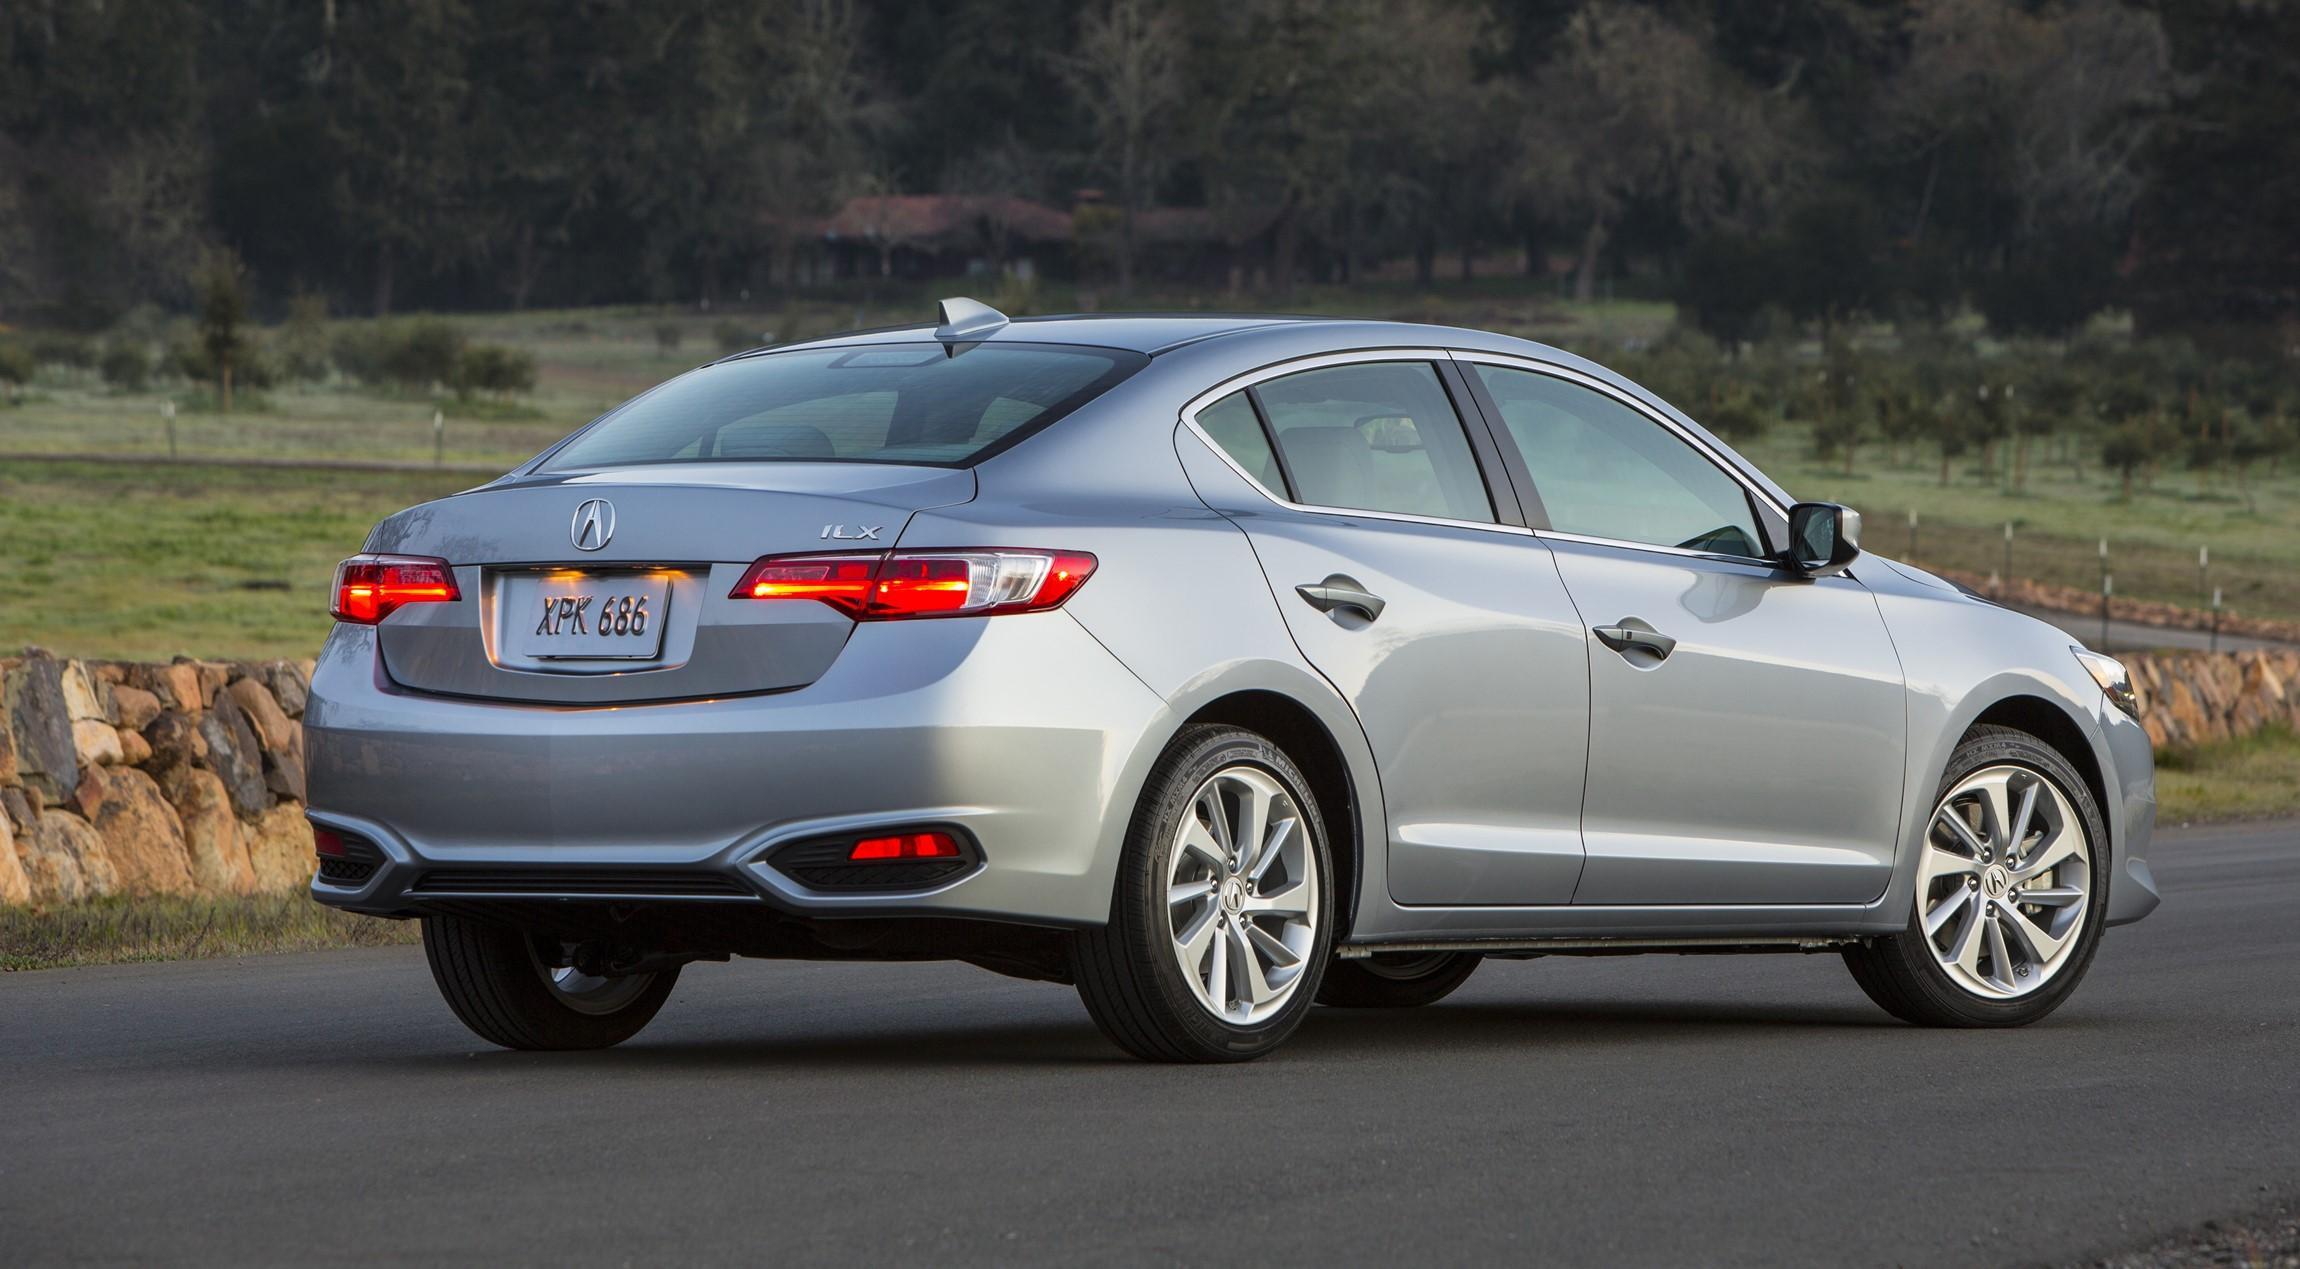 Ilx Acura 2015 2015 Acura Ilx Review Wheels Ca 2016 Acura